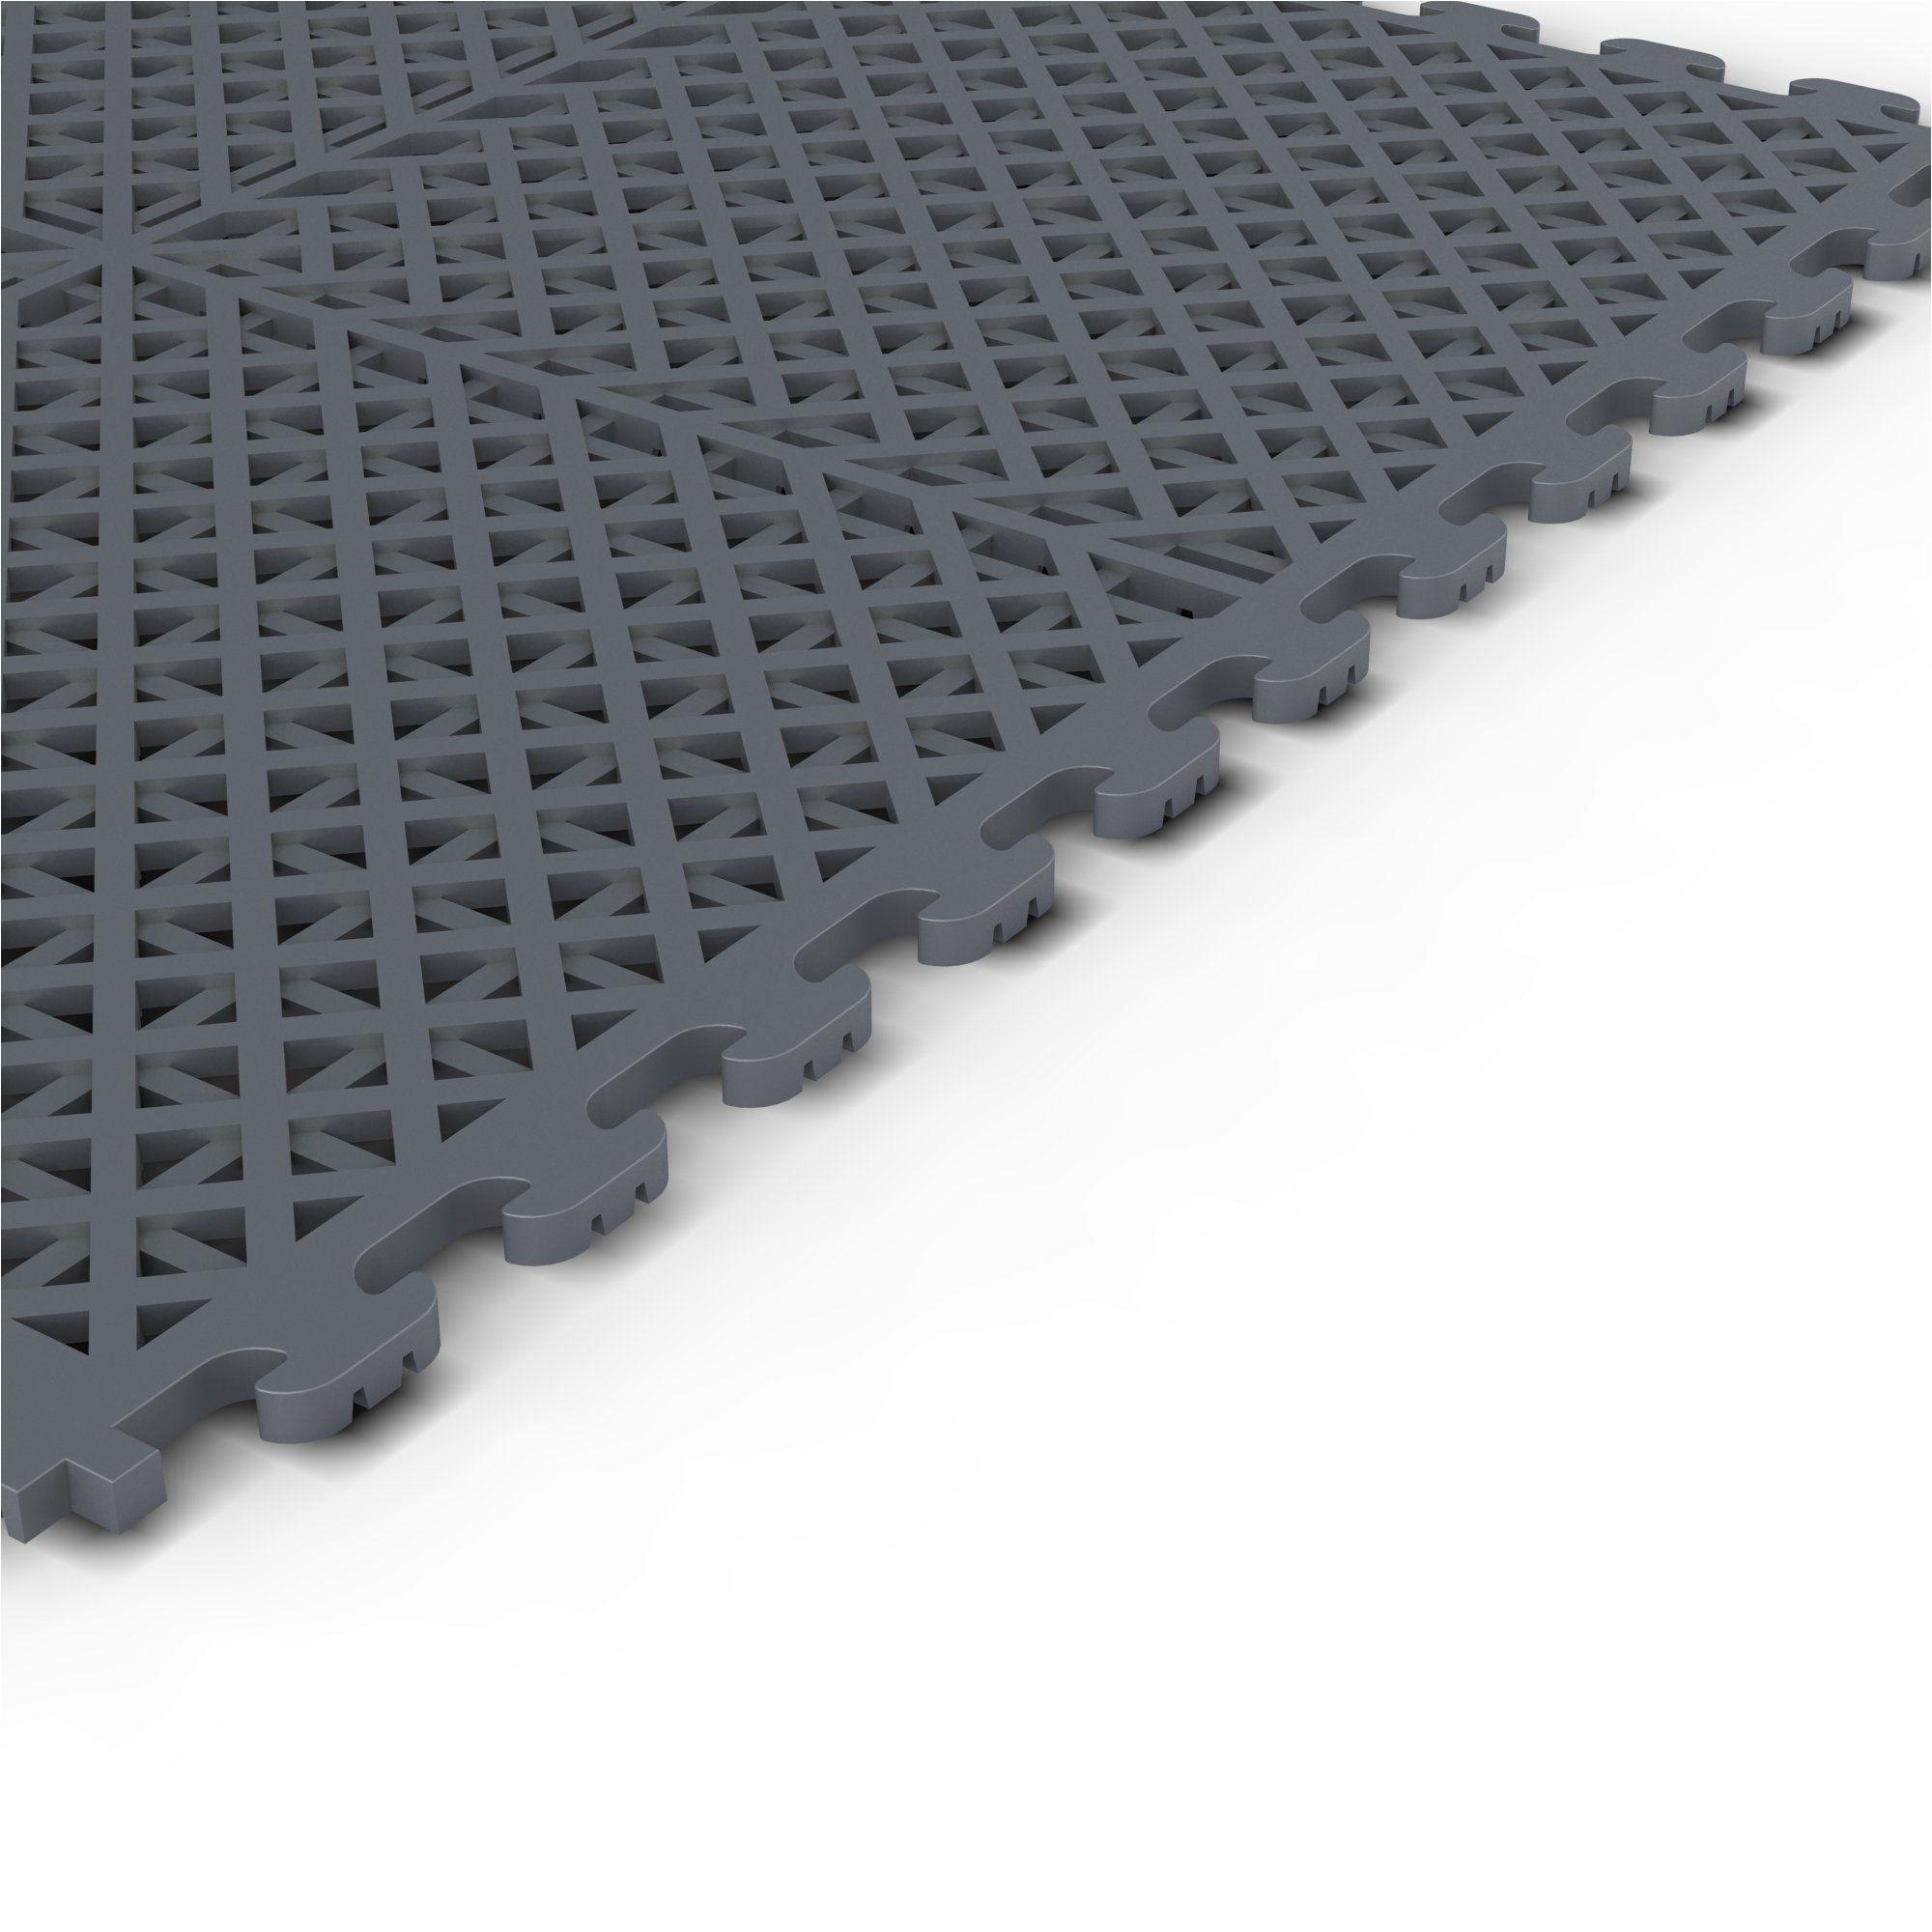 norsk stor nsmpvn6dg vented multi purpose pvc flooring dove gray 6 pack rubber floor coverings amazon com